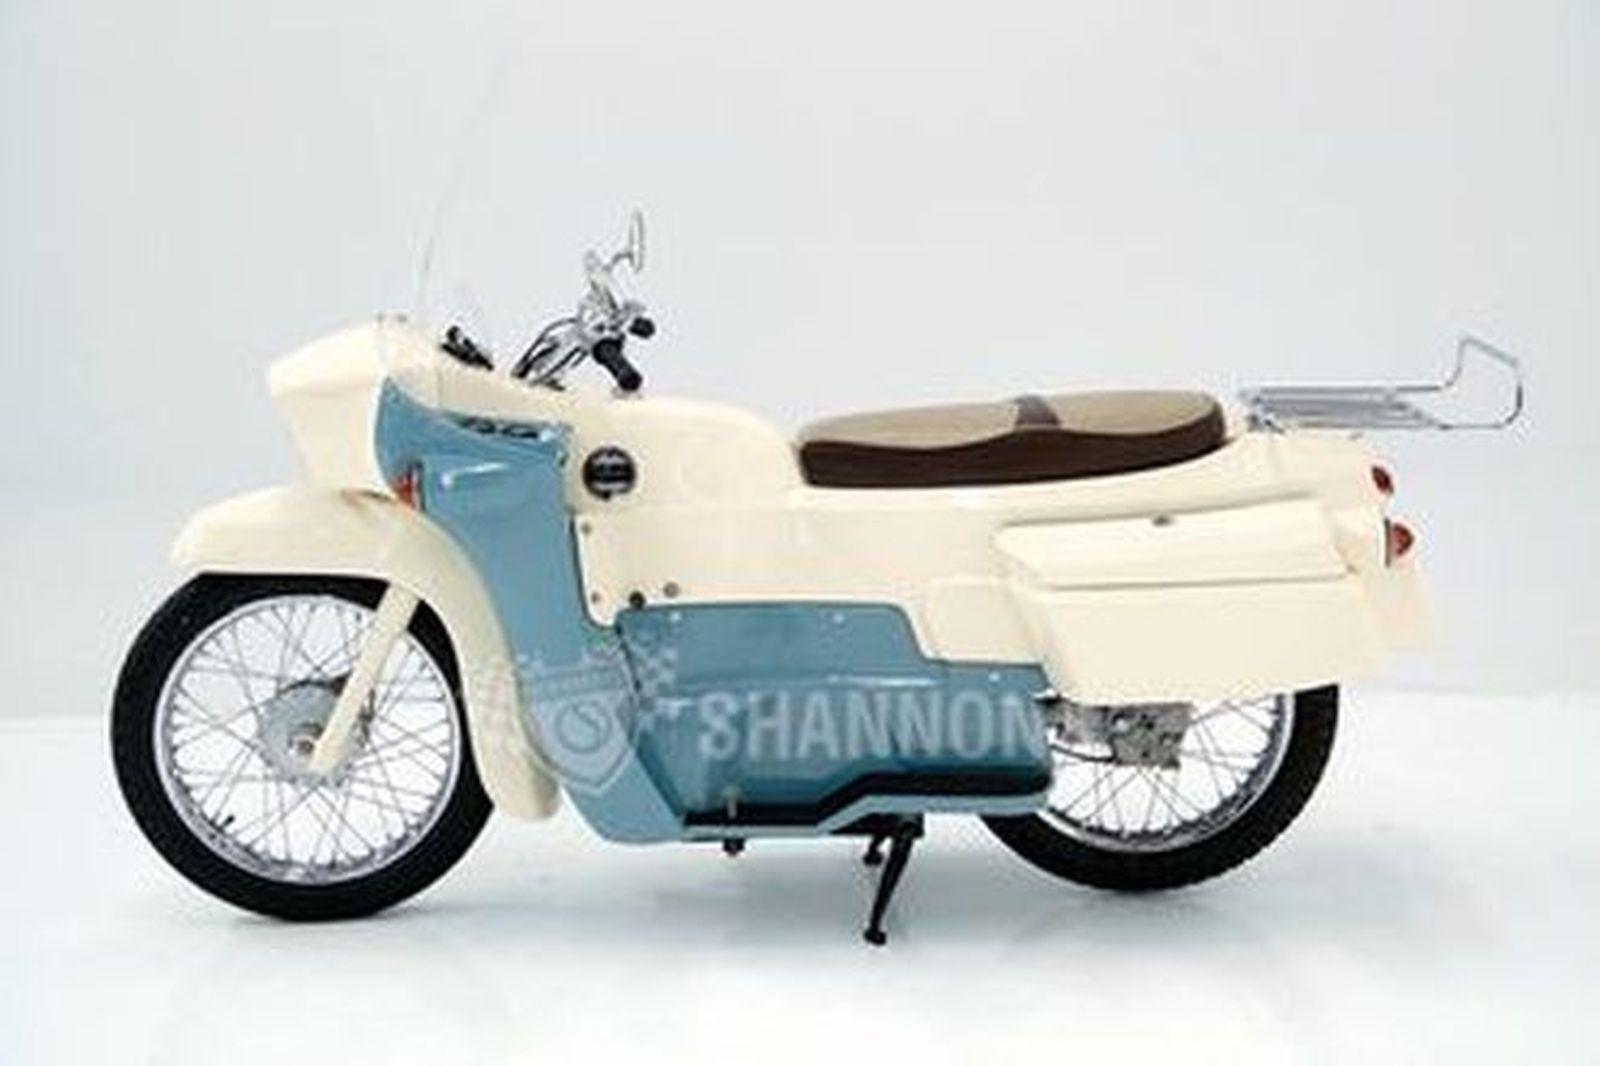 Velocette 198cc Vogue Motorcycle